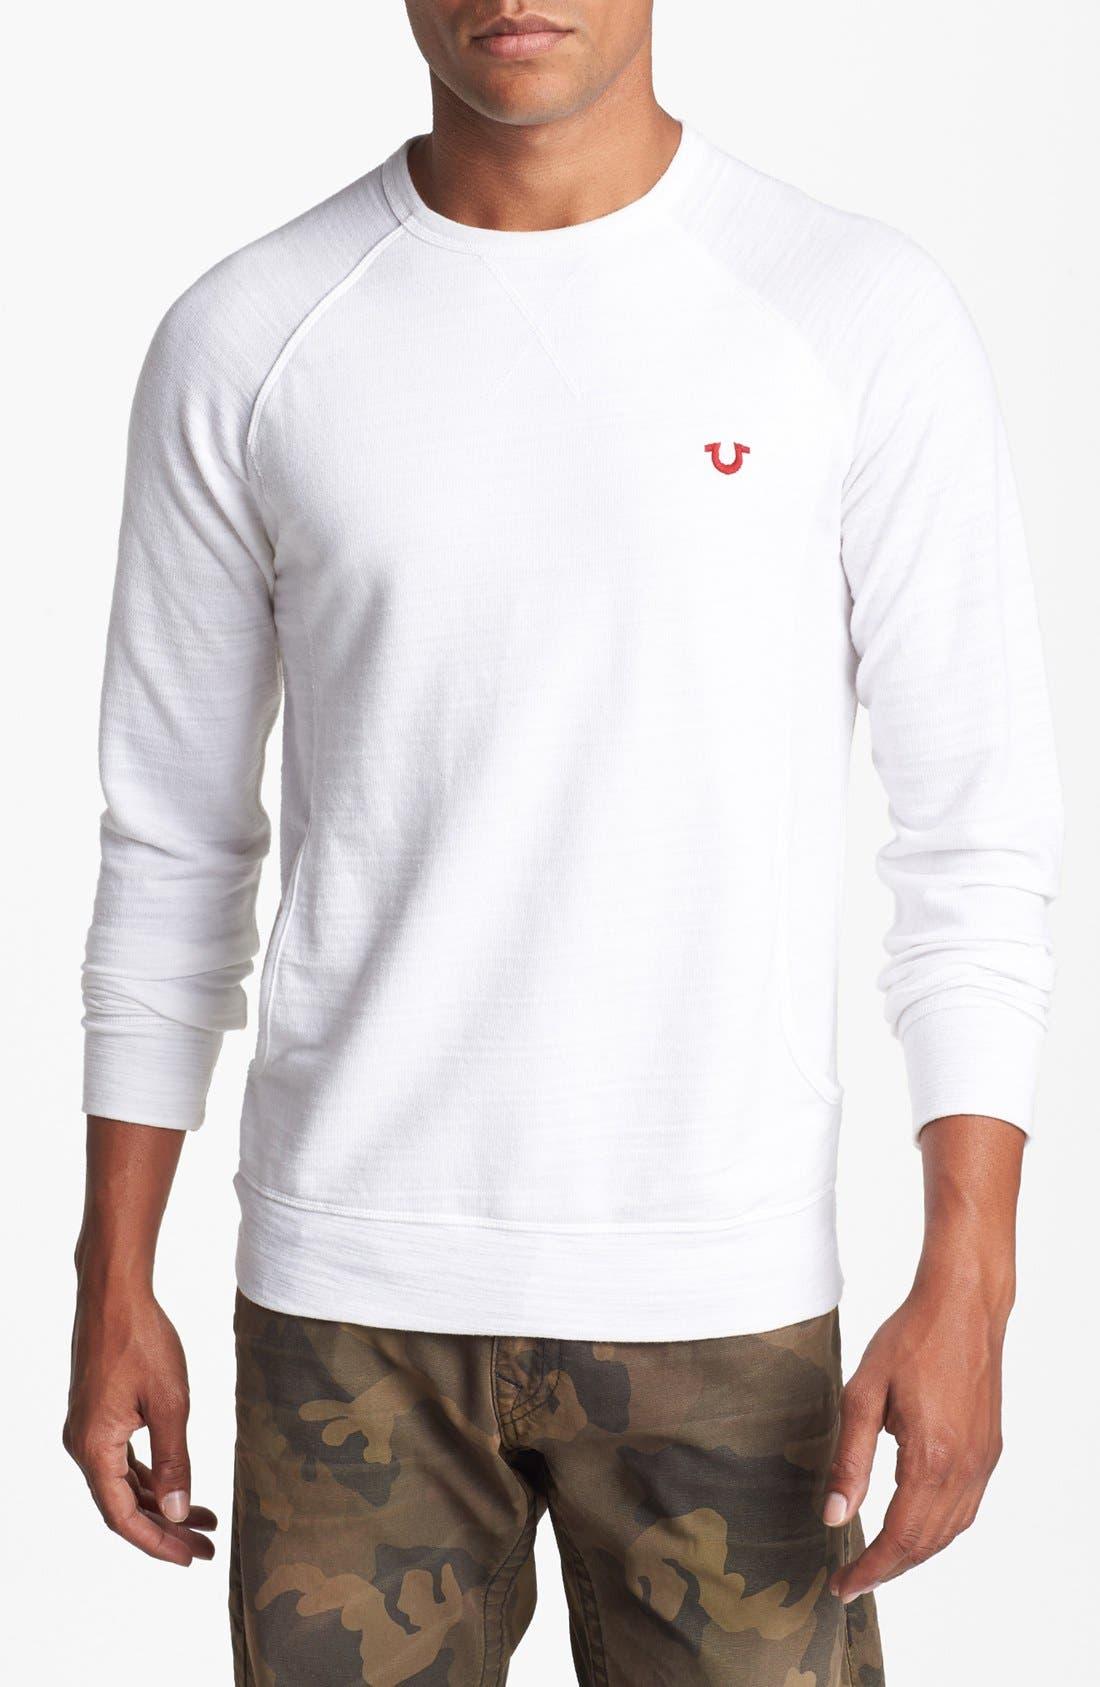 Main Image - True Religion Brand Jeans Crewneck Sweatshirt